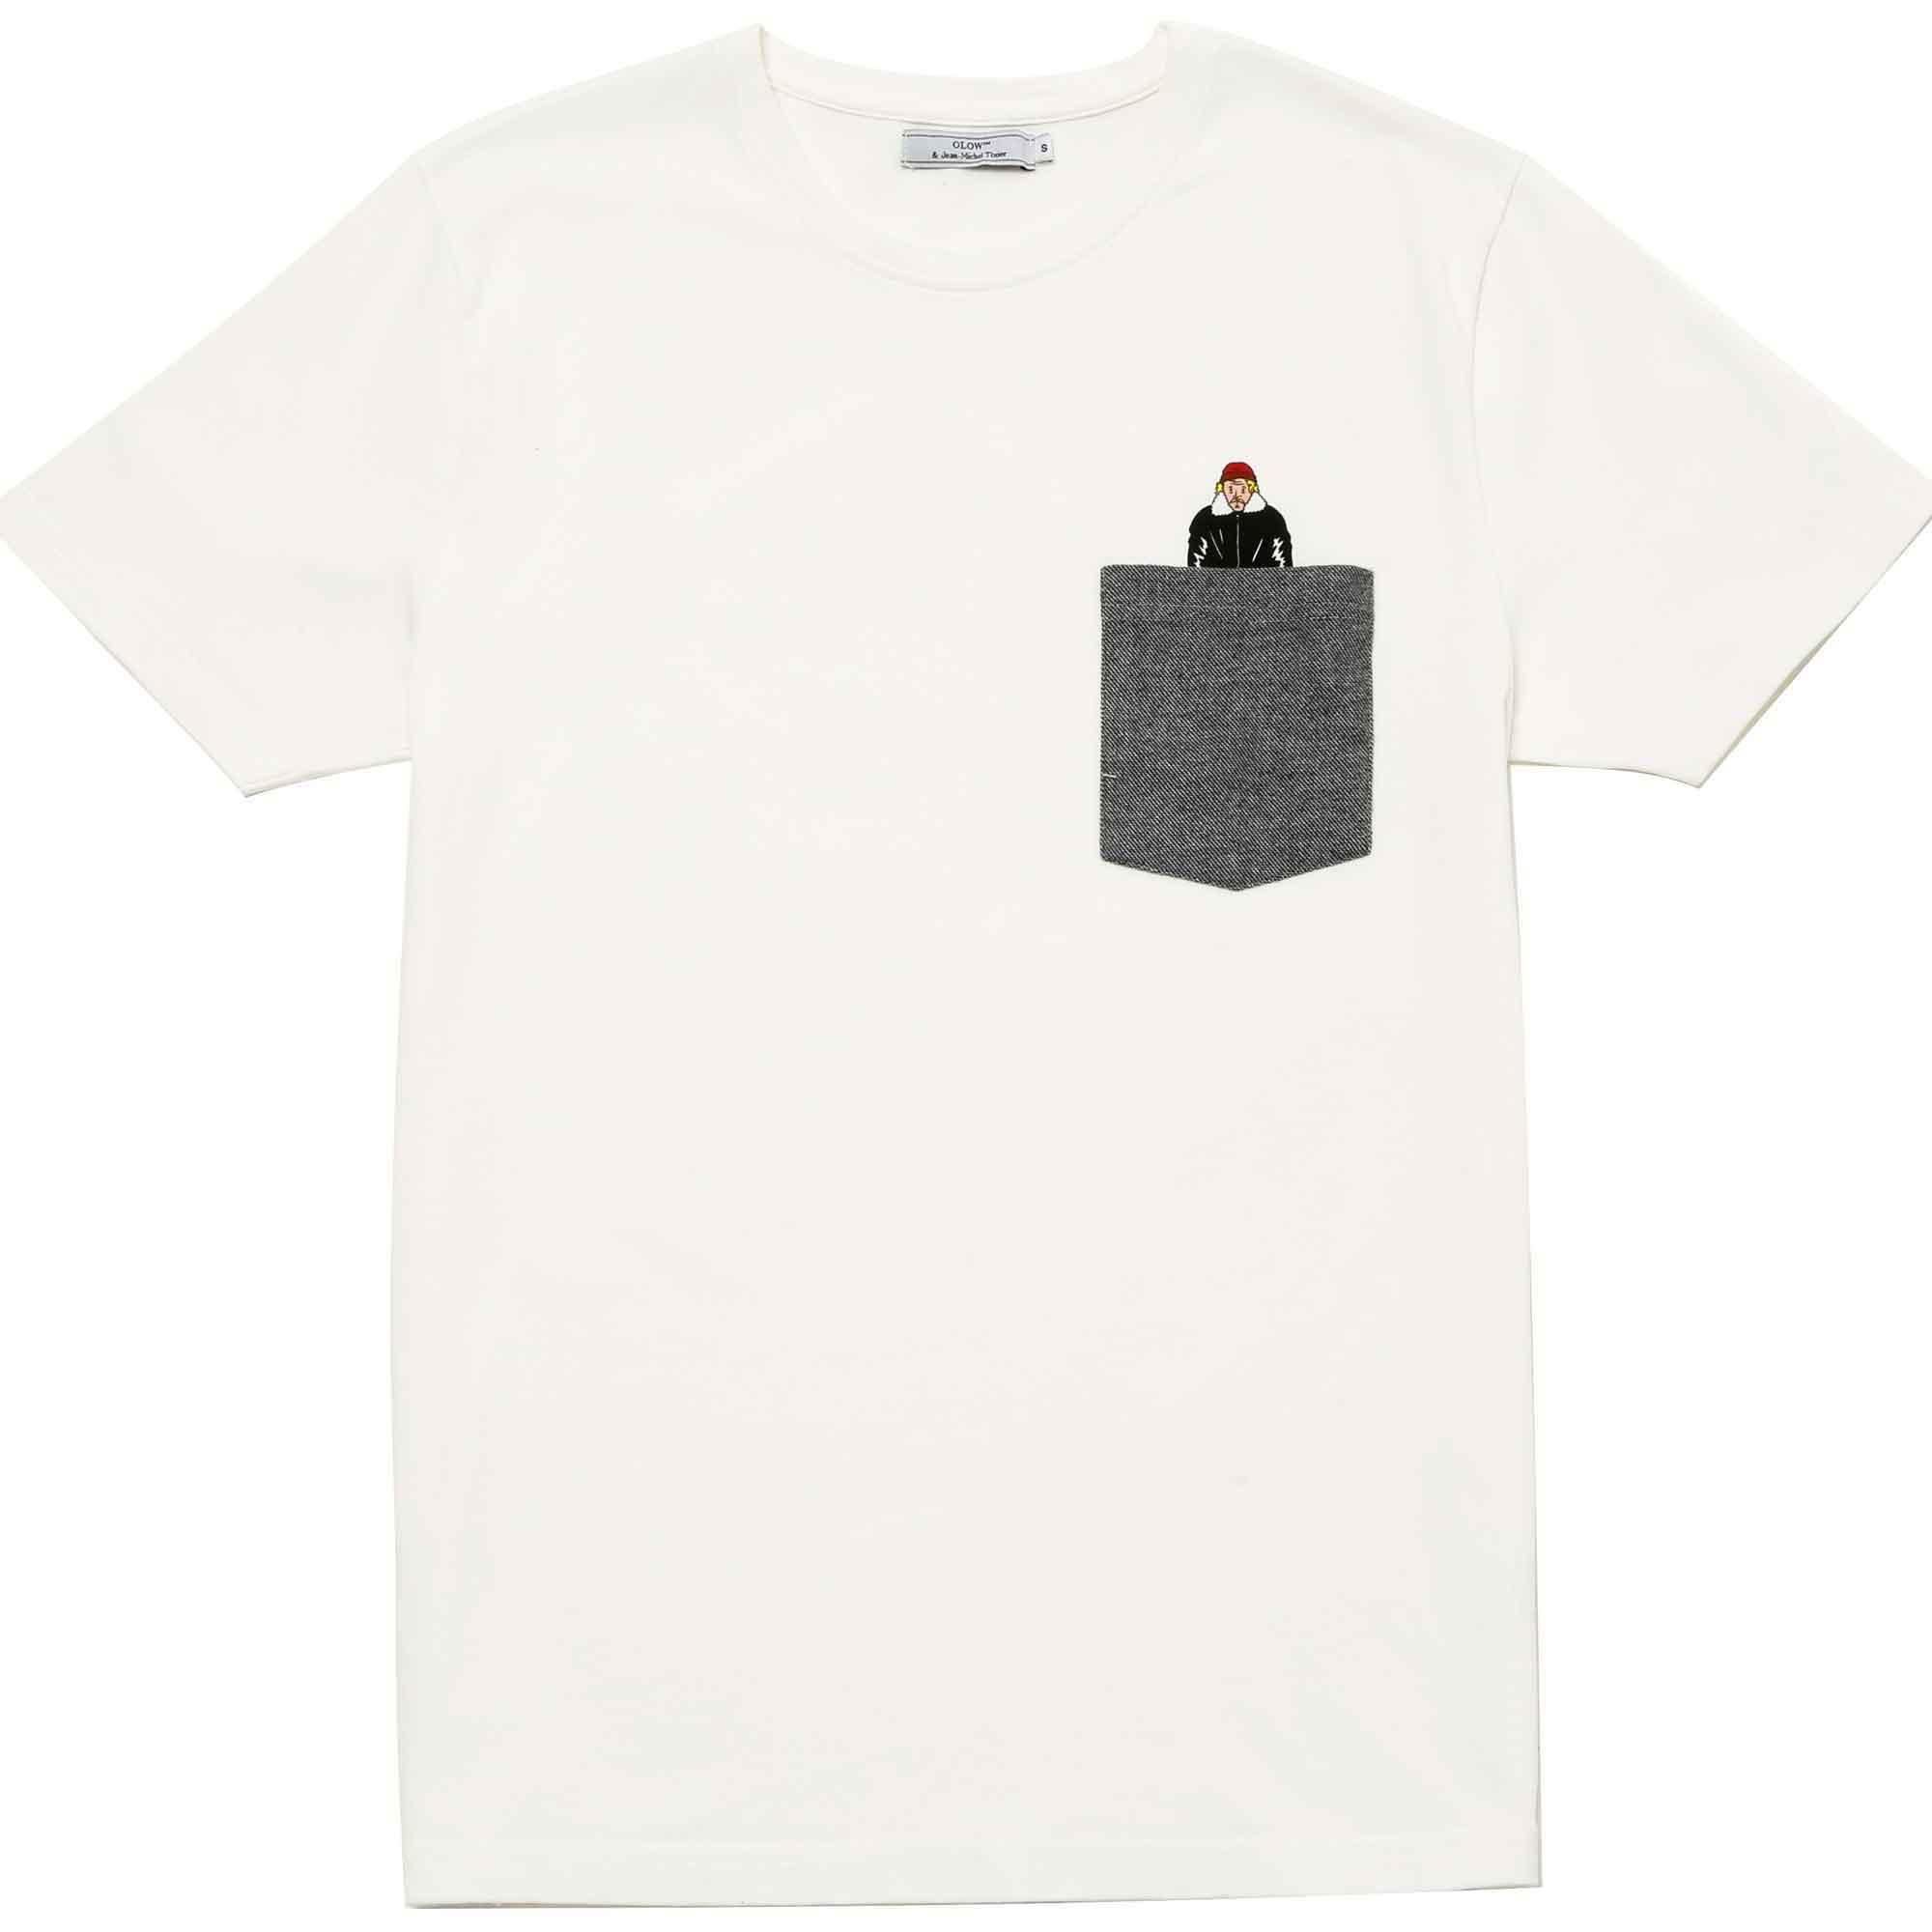 T-shirt leñador